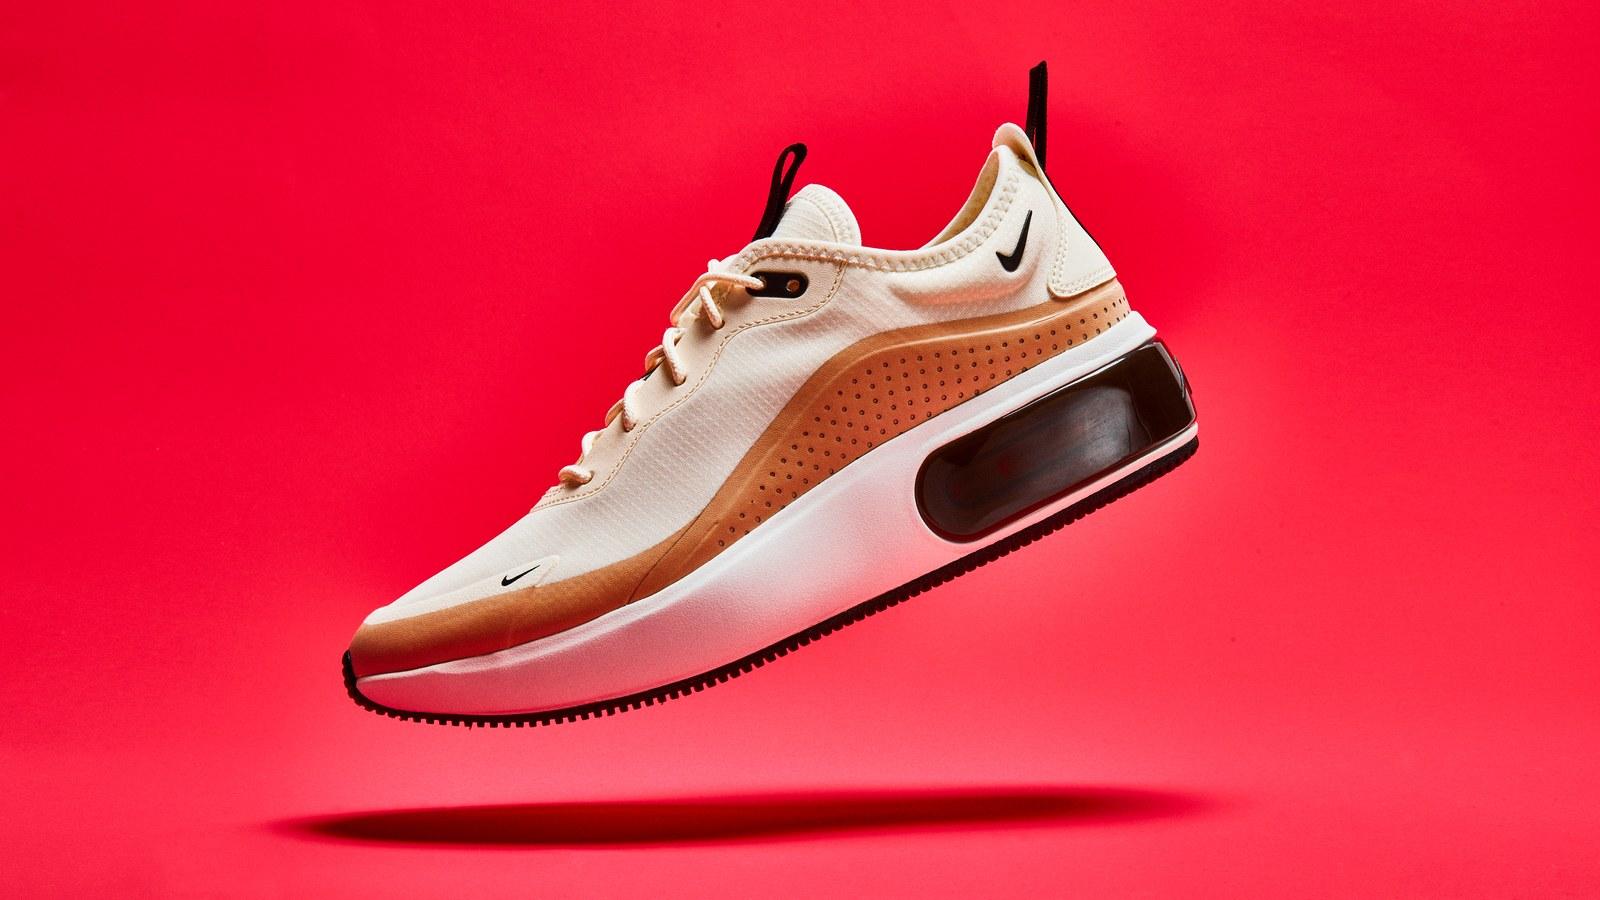 19fb1bca81 Feb 21, 2019. You can still buy the Nike Air Max ...